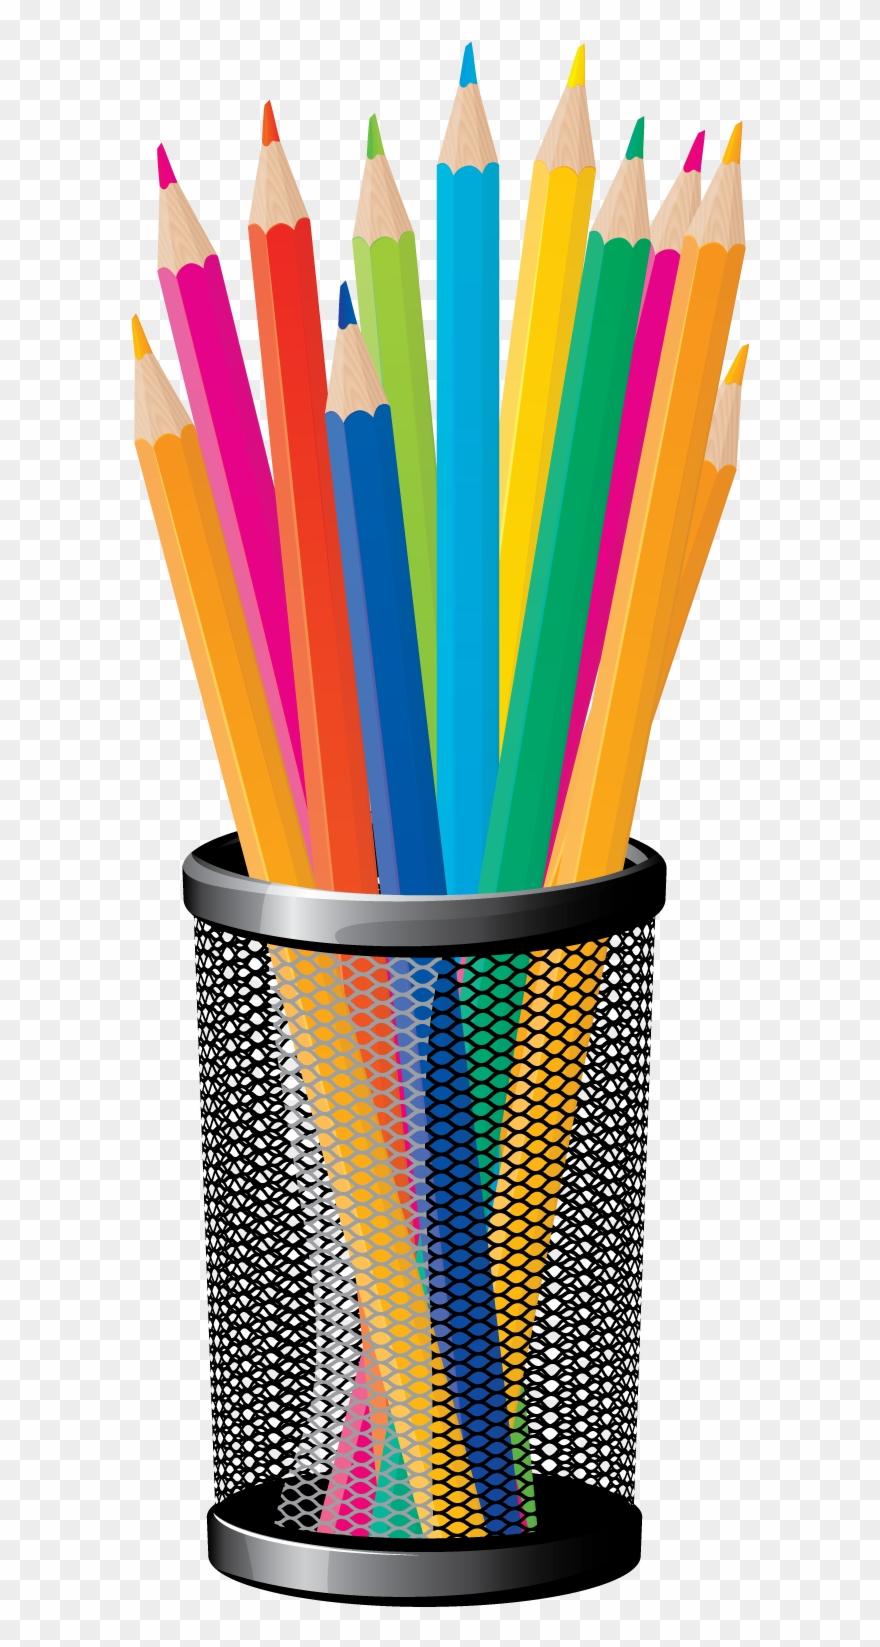 Transparent background colored . Clipart pencil education